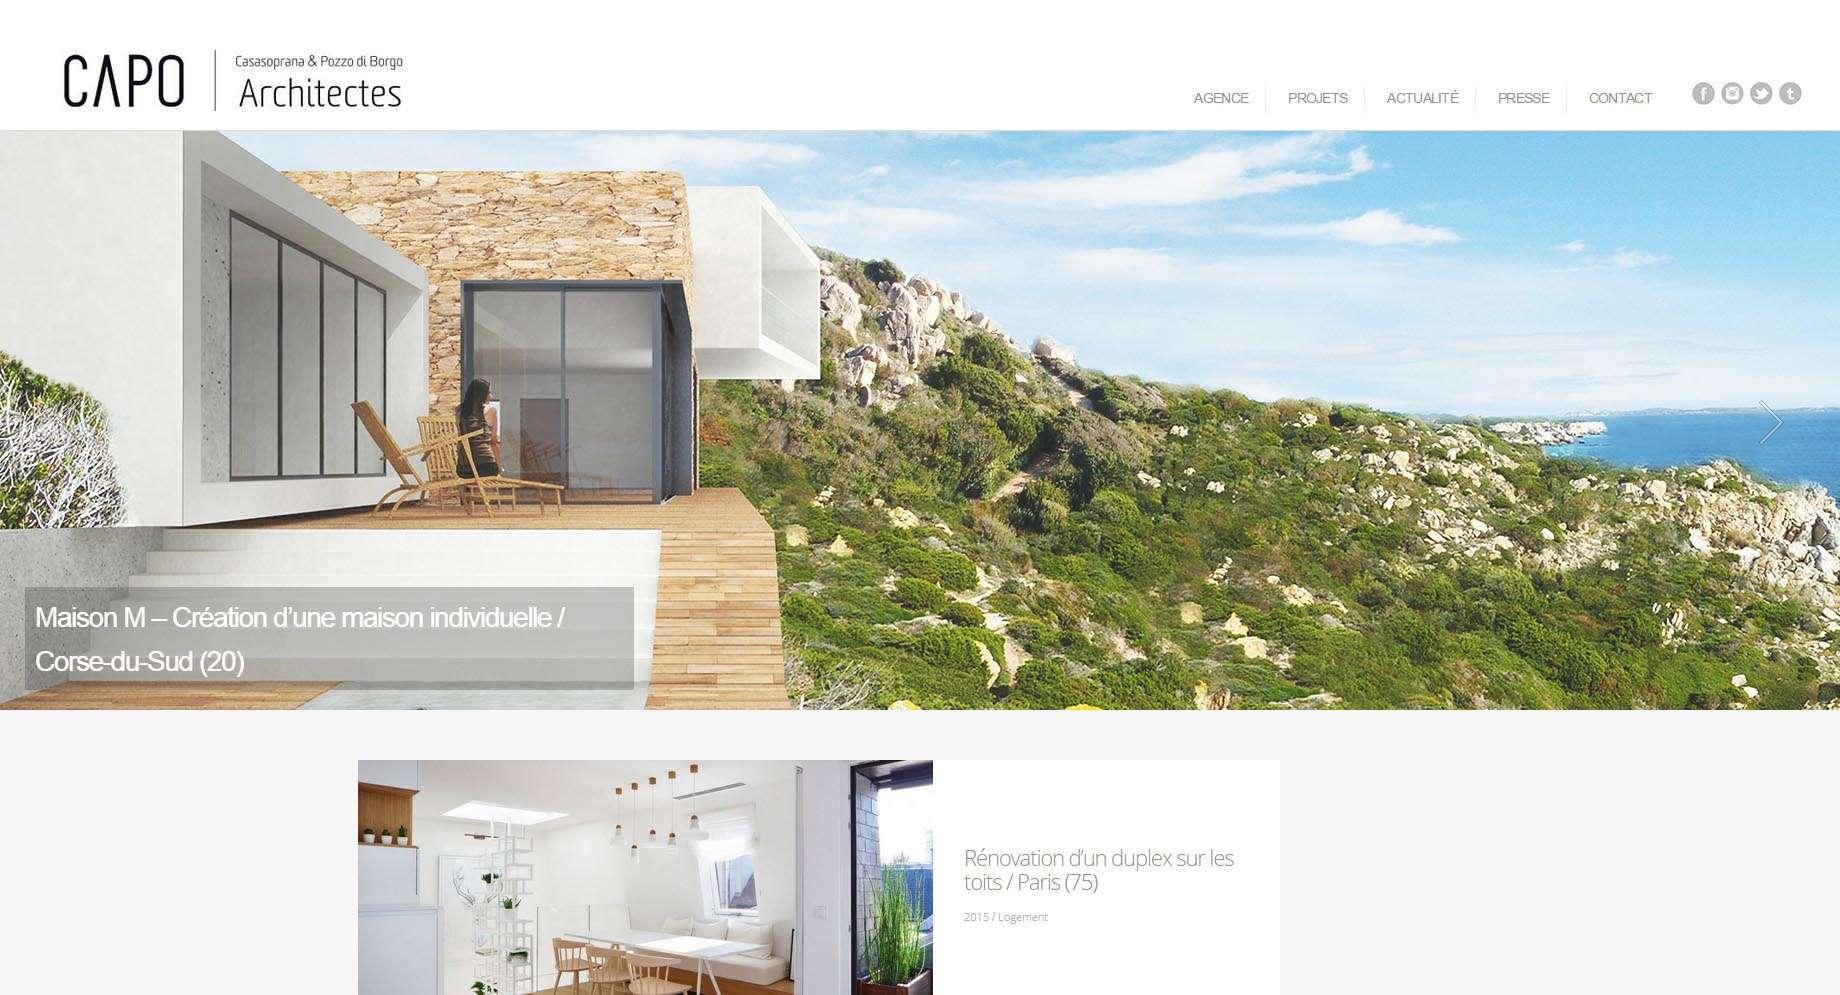 capo architectes agence d 39 architecture paris ajaccio josh digital. Black Bedroom Furniture Sets. Home Design Ideas